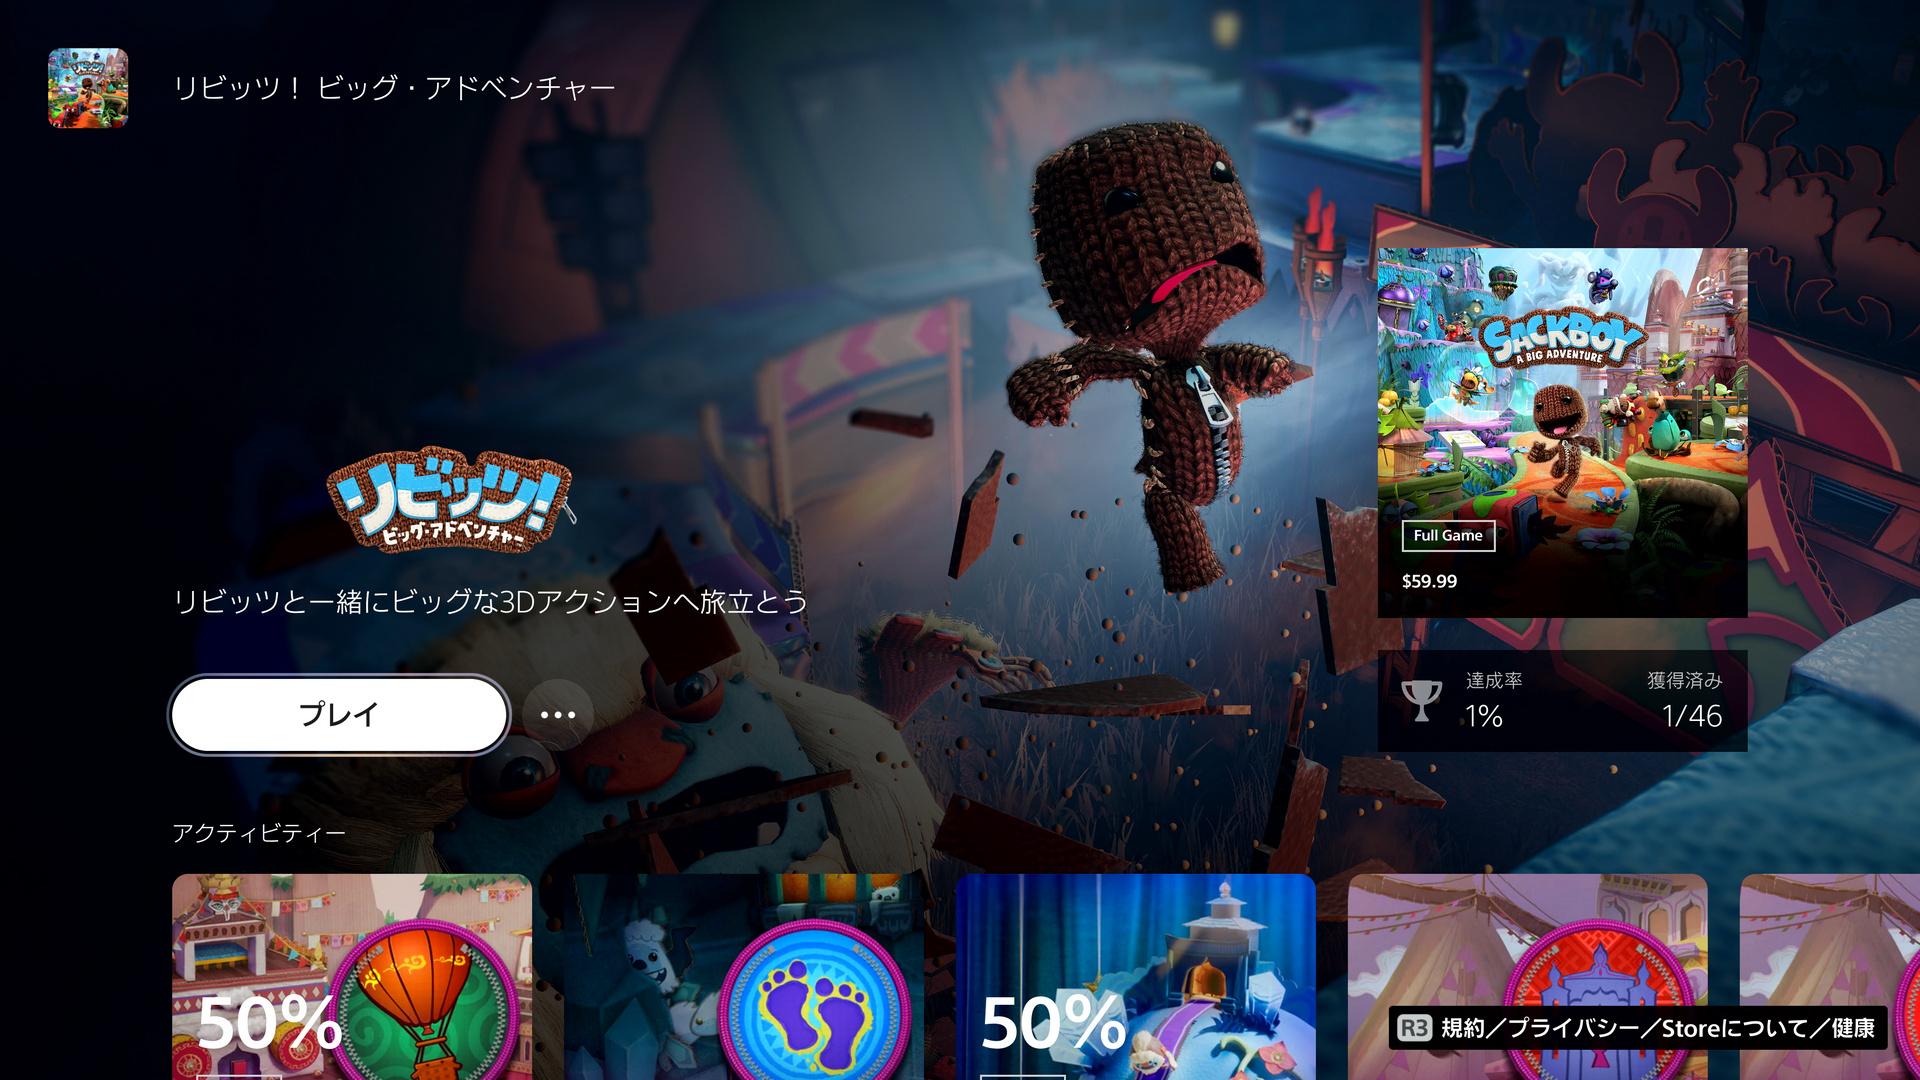 Ps5は自動でネタバレ防止 Pinp子画面表示や公式攻略動画など次世代ux初公開 Engadget 日本版